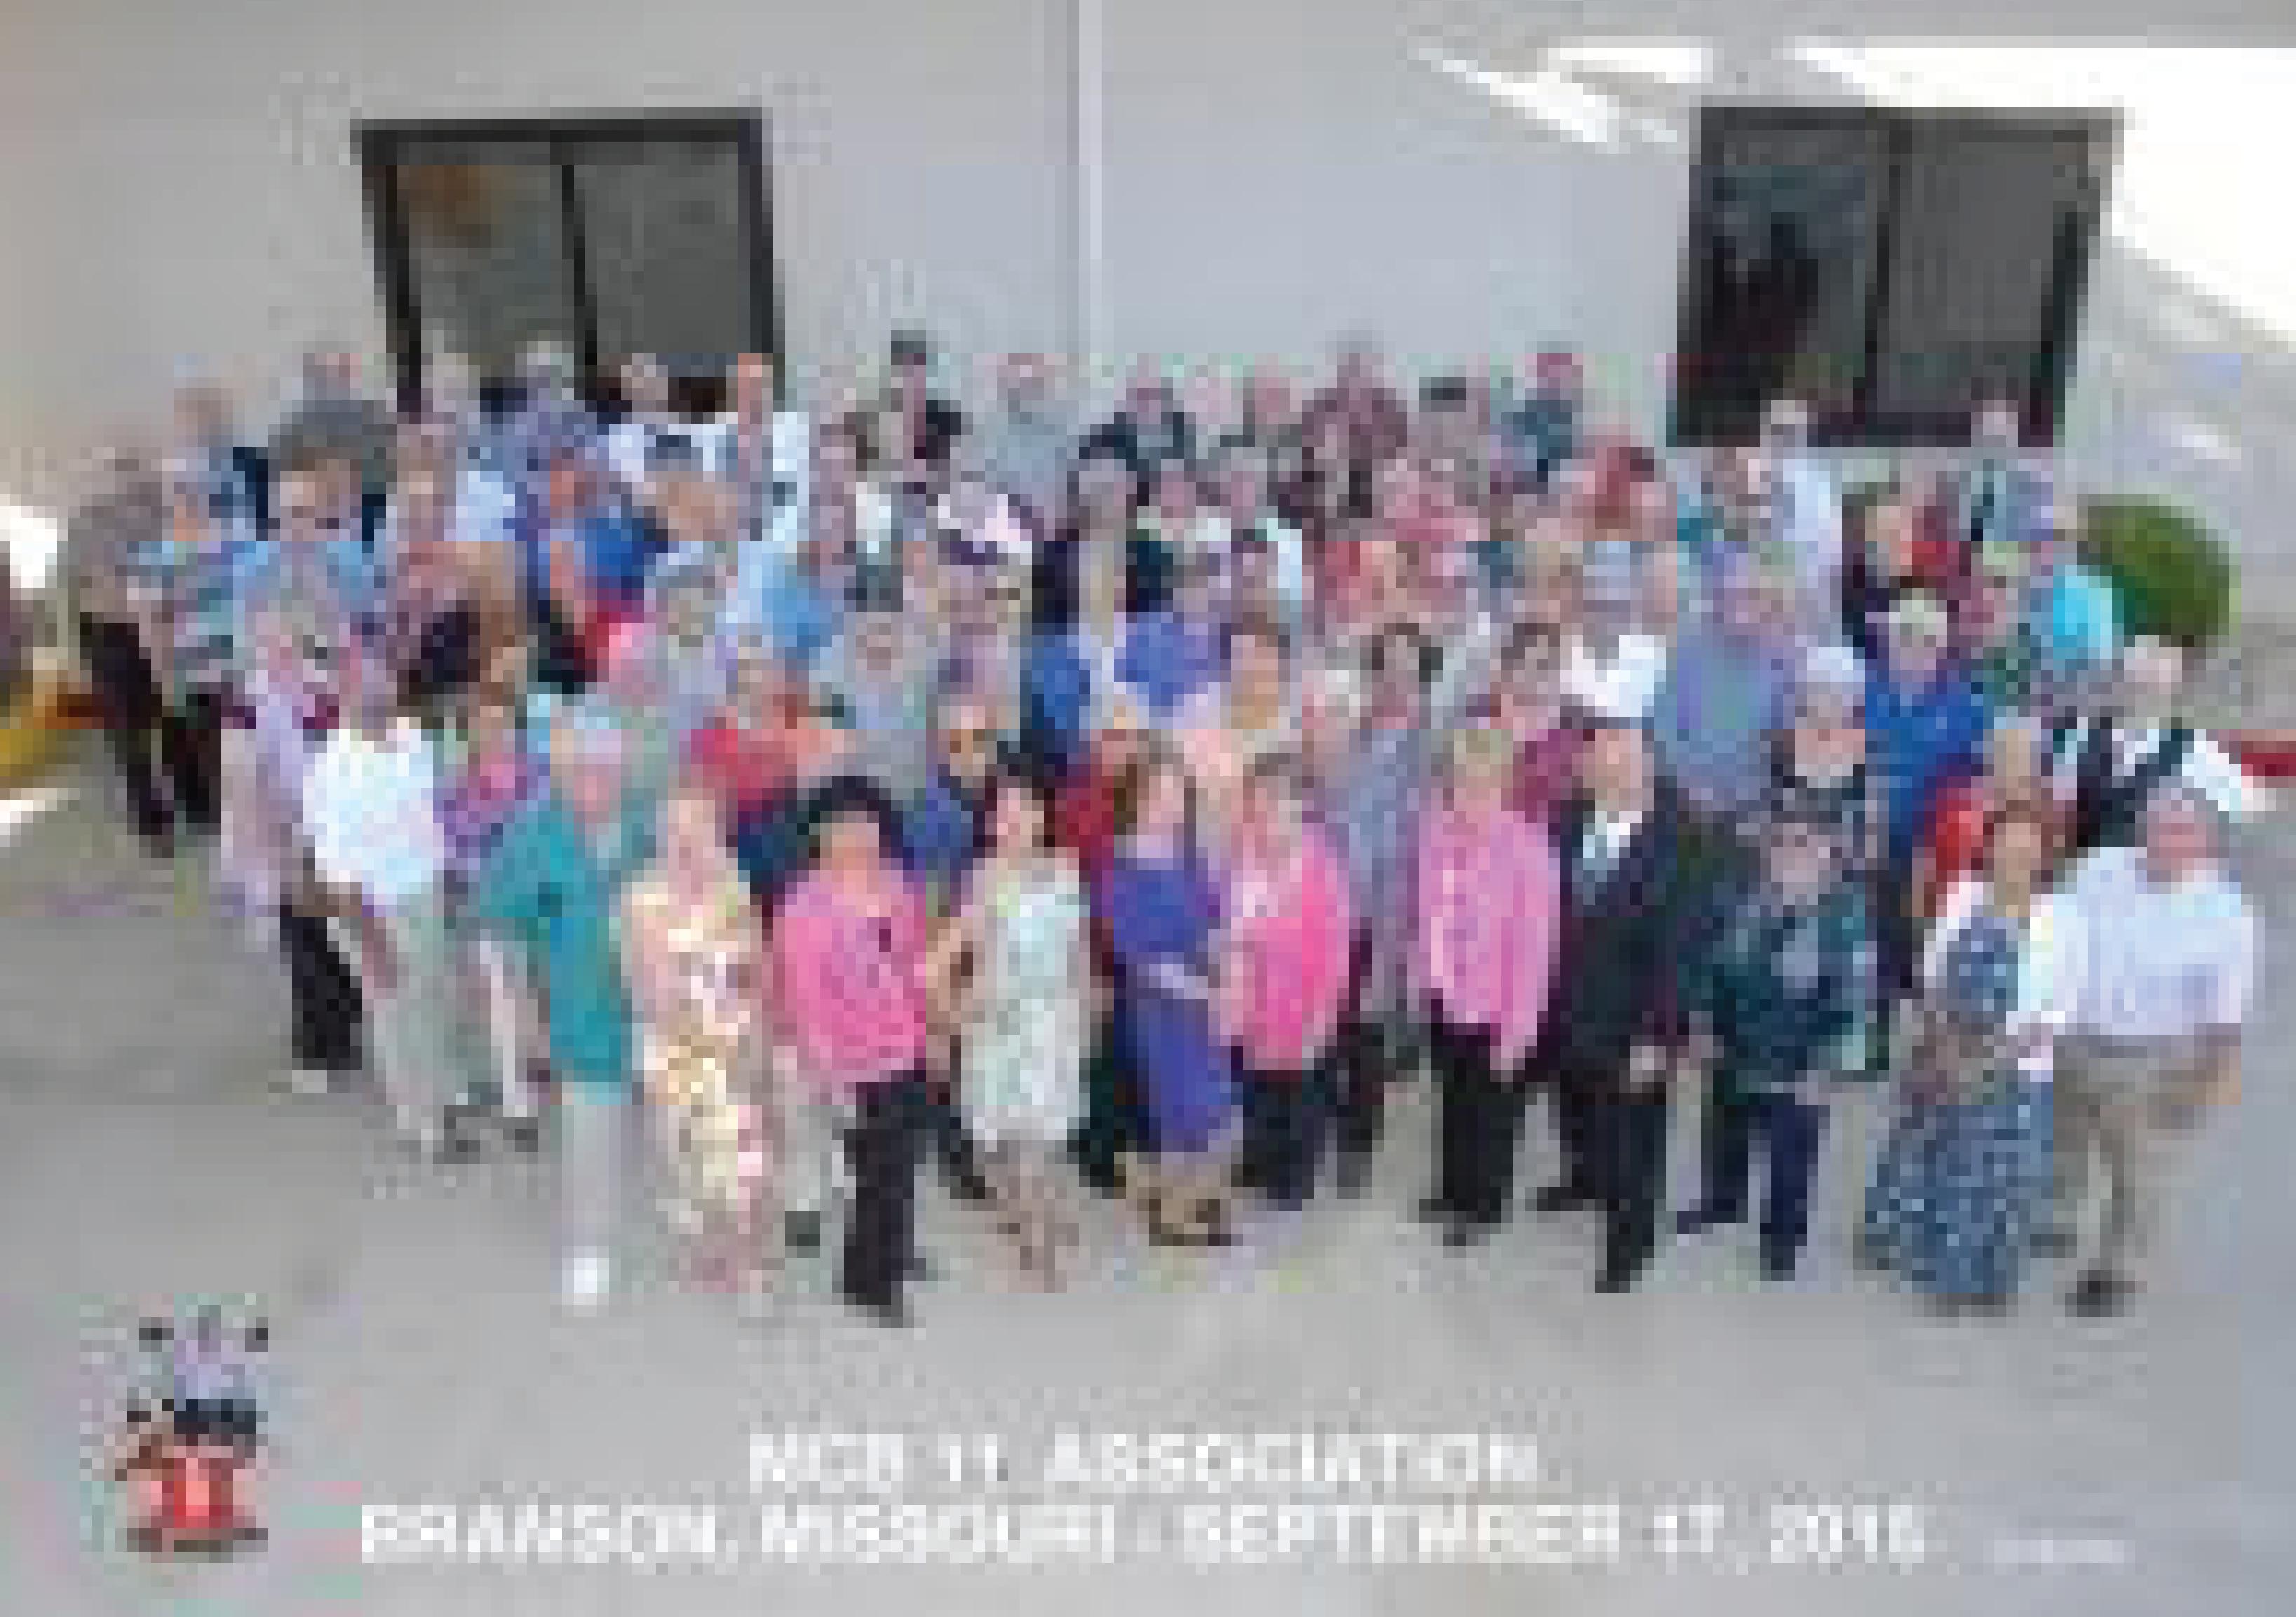 MCB 11 Association